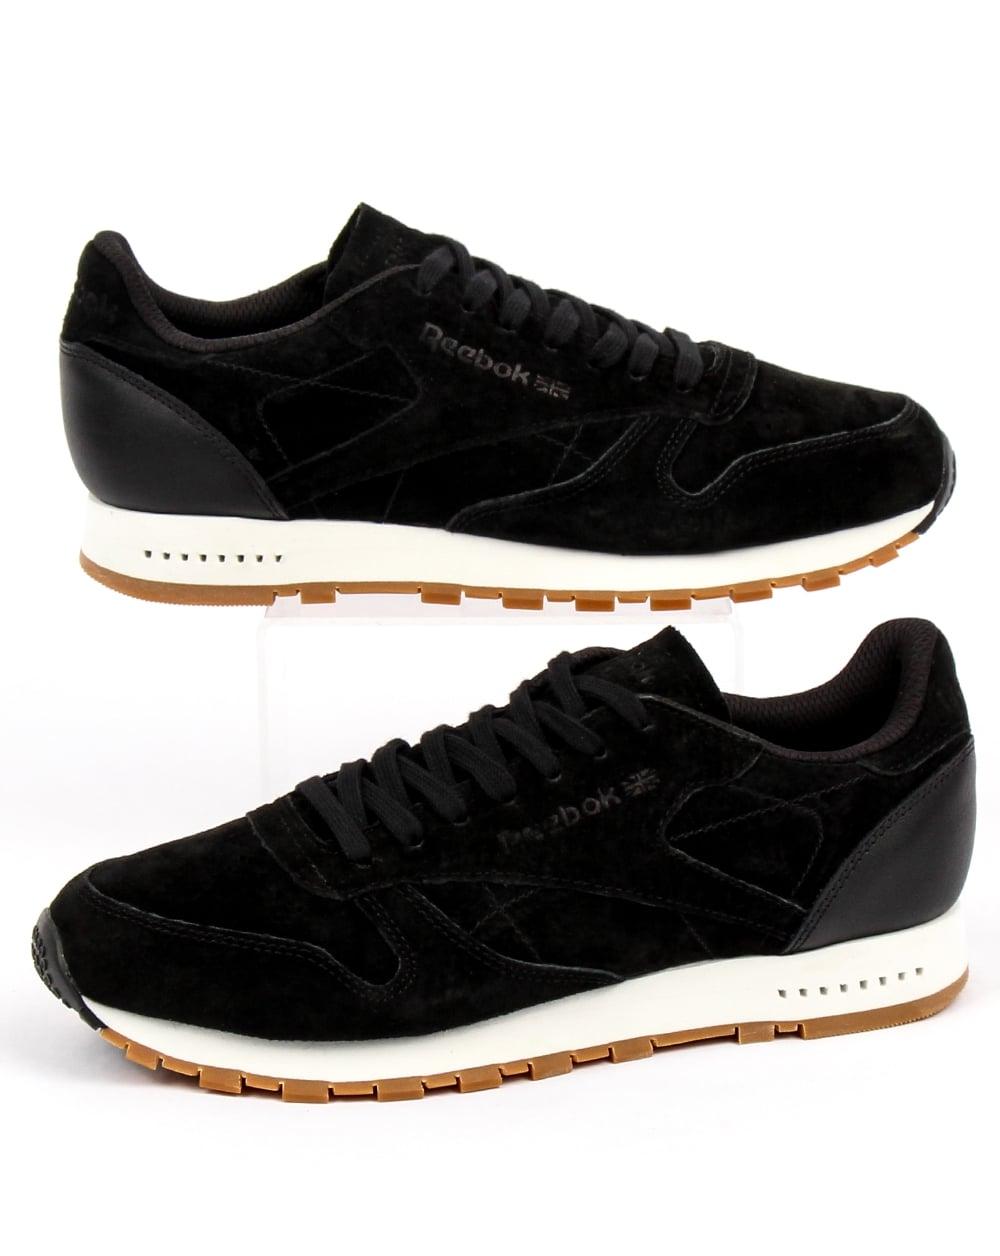 e6990c21374768 Reebok Reebok Classic Leather Sg Trainers Black chalk